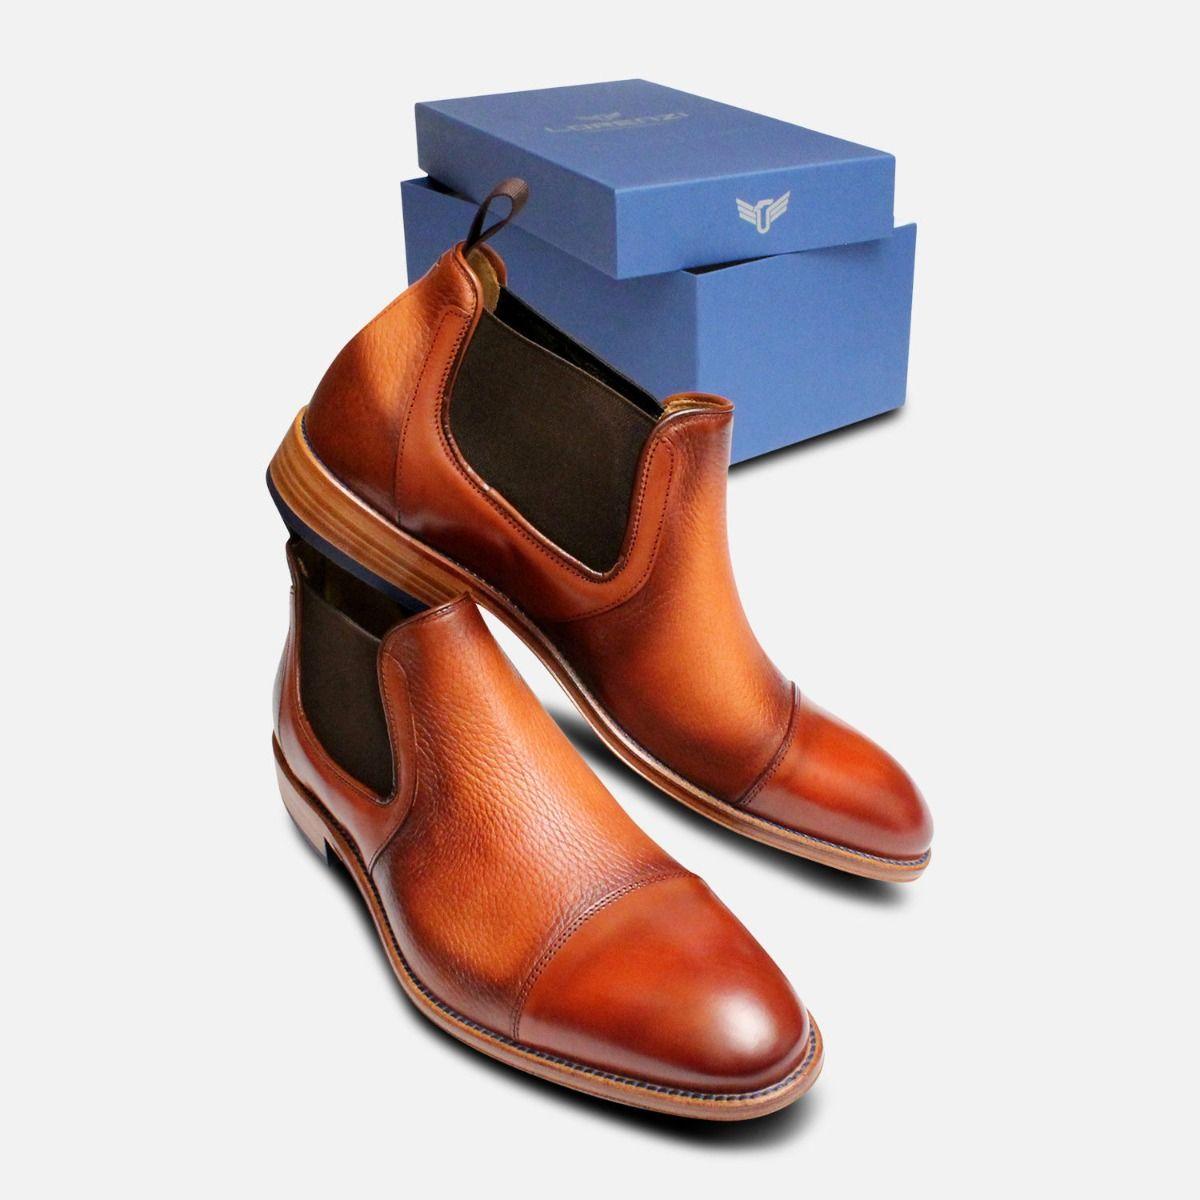 d3df006f462e Deer Skin Mens Chelsea Boots in Antique Tan